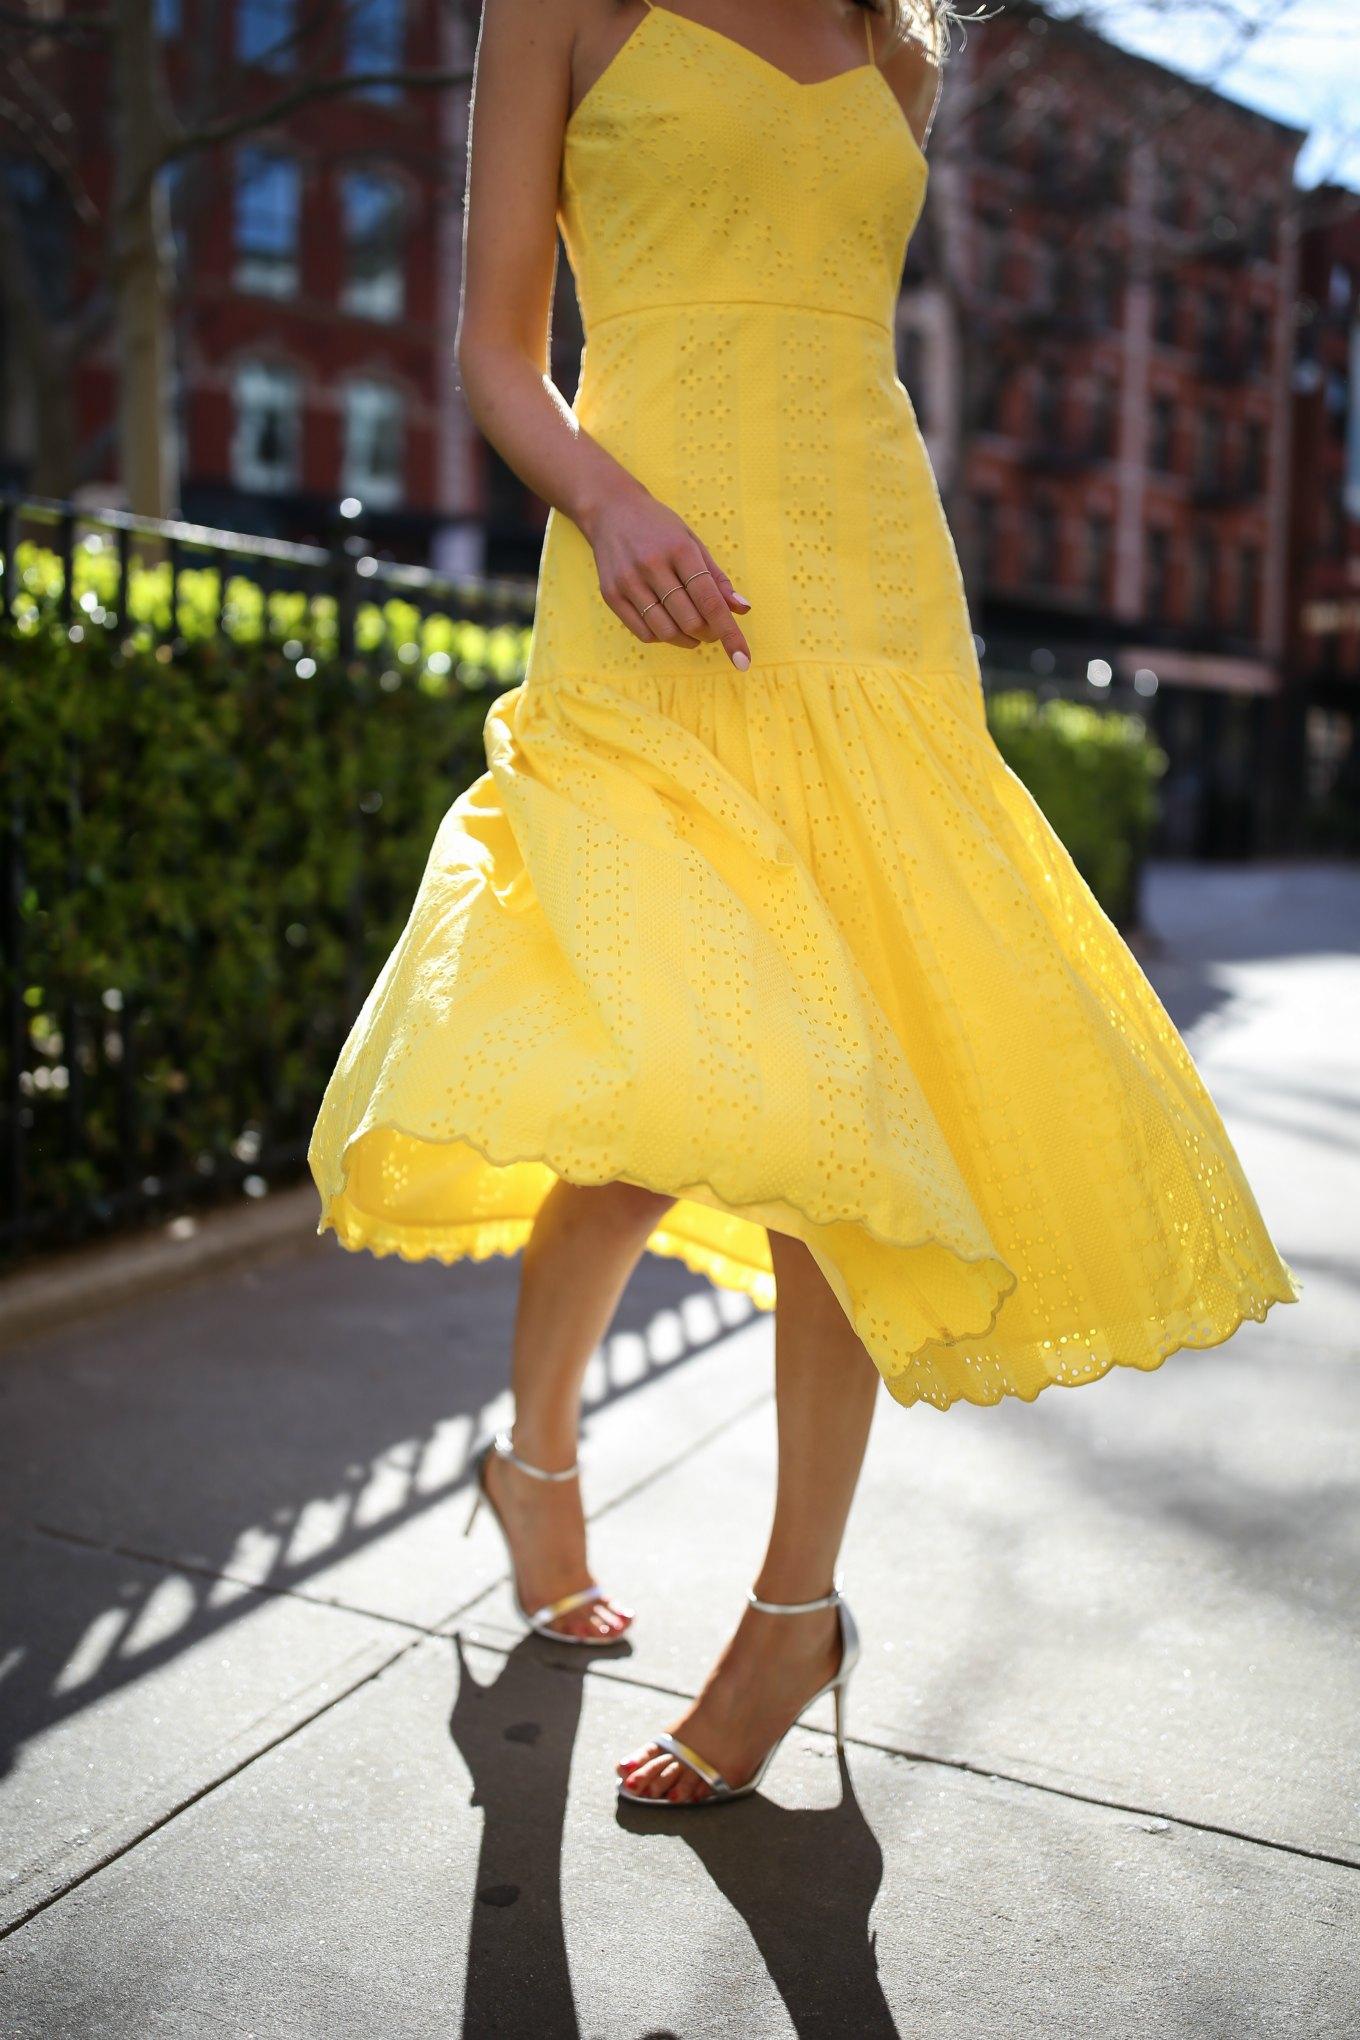 top-spring-fashion-trends-yellow-eyelet-j-crew-midi-dress-silver-metallic-heeled-sandals-red-clutch-tassel-earrings9